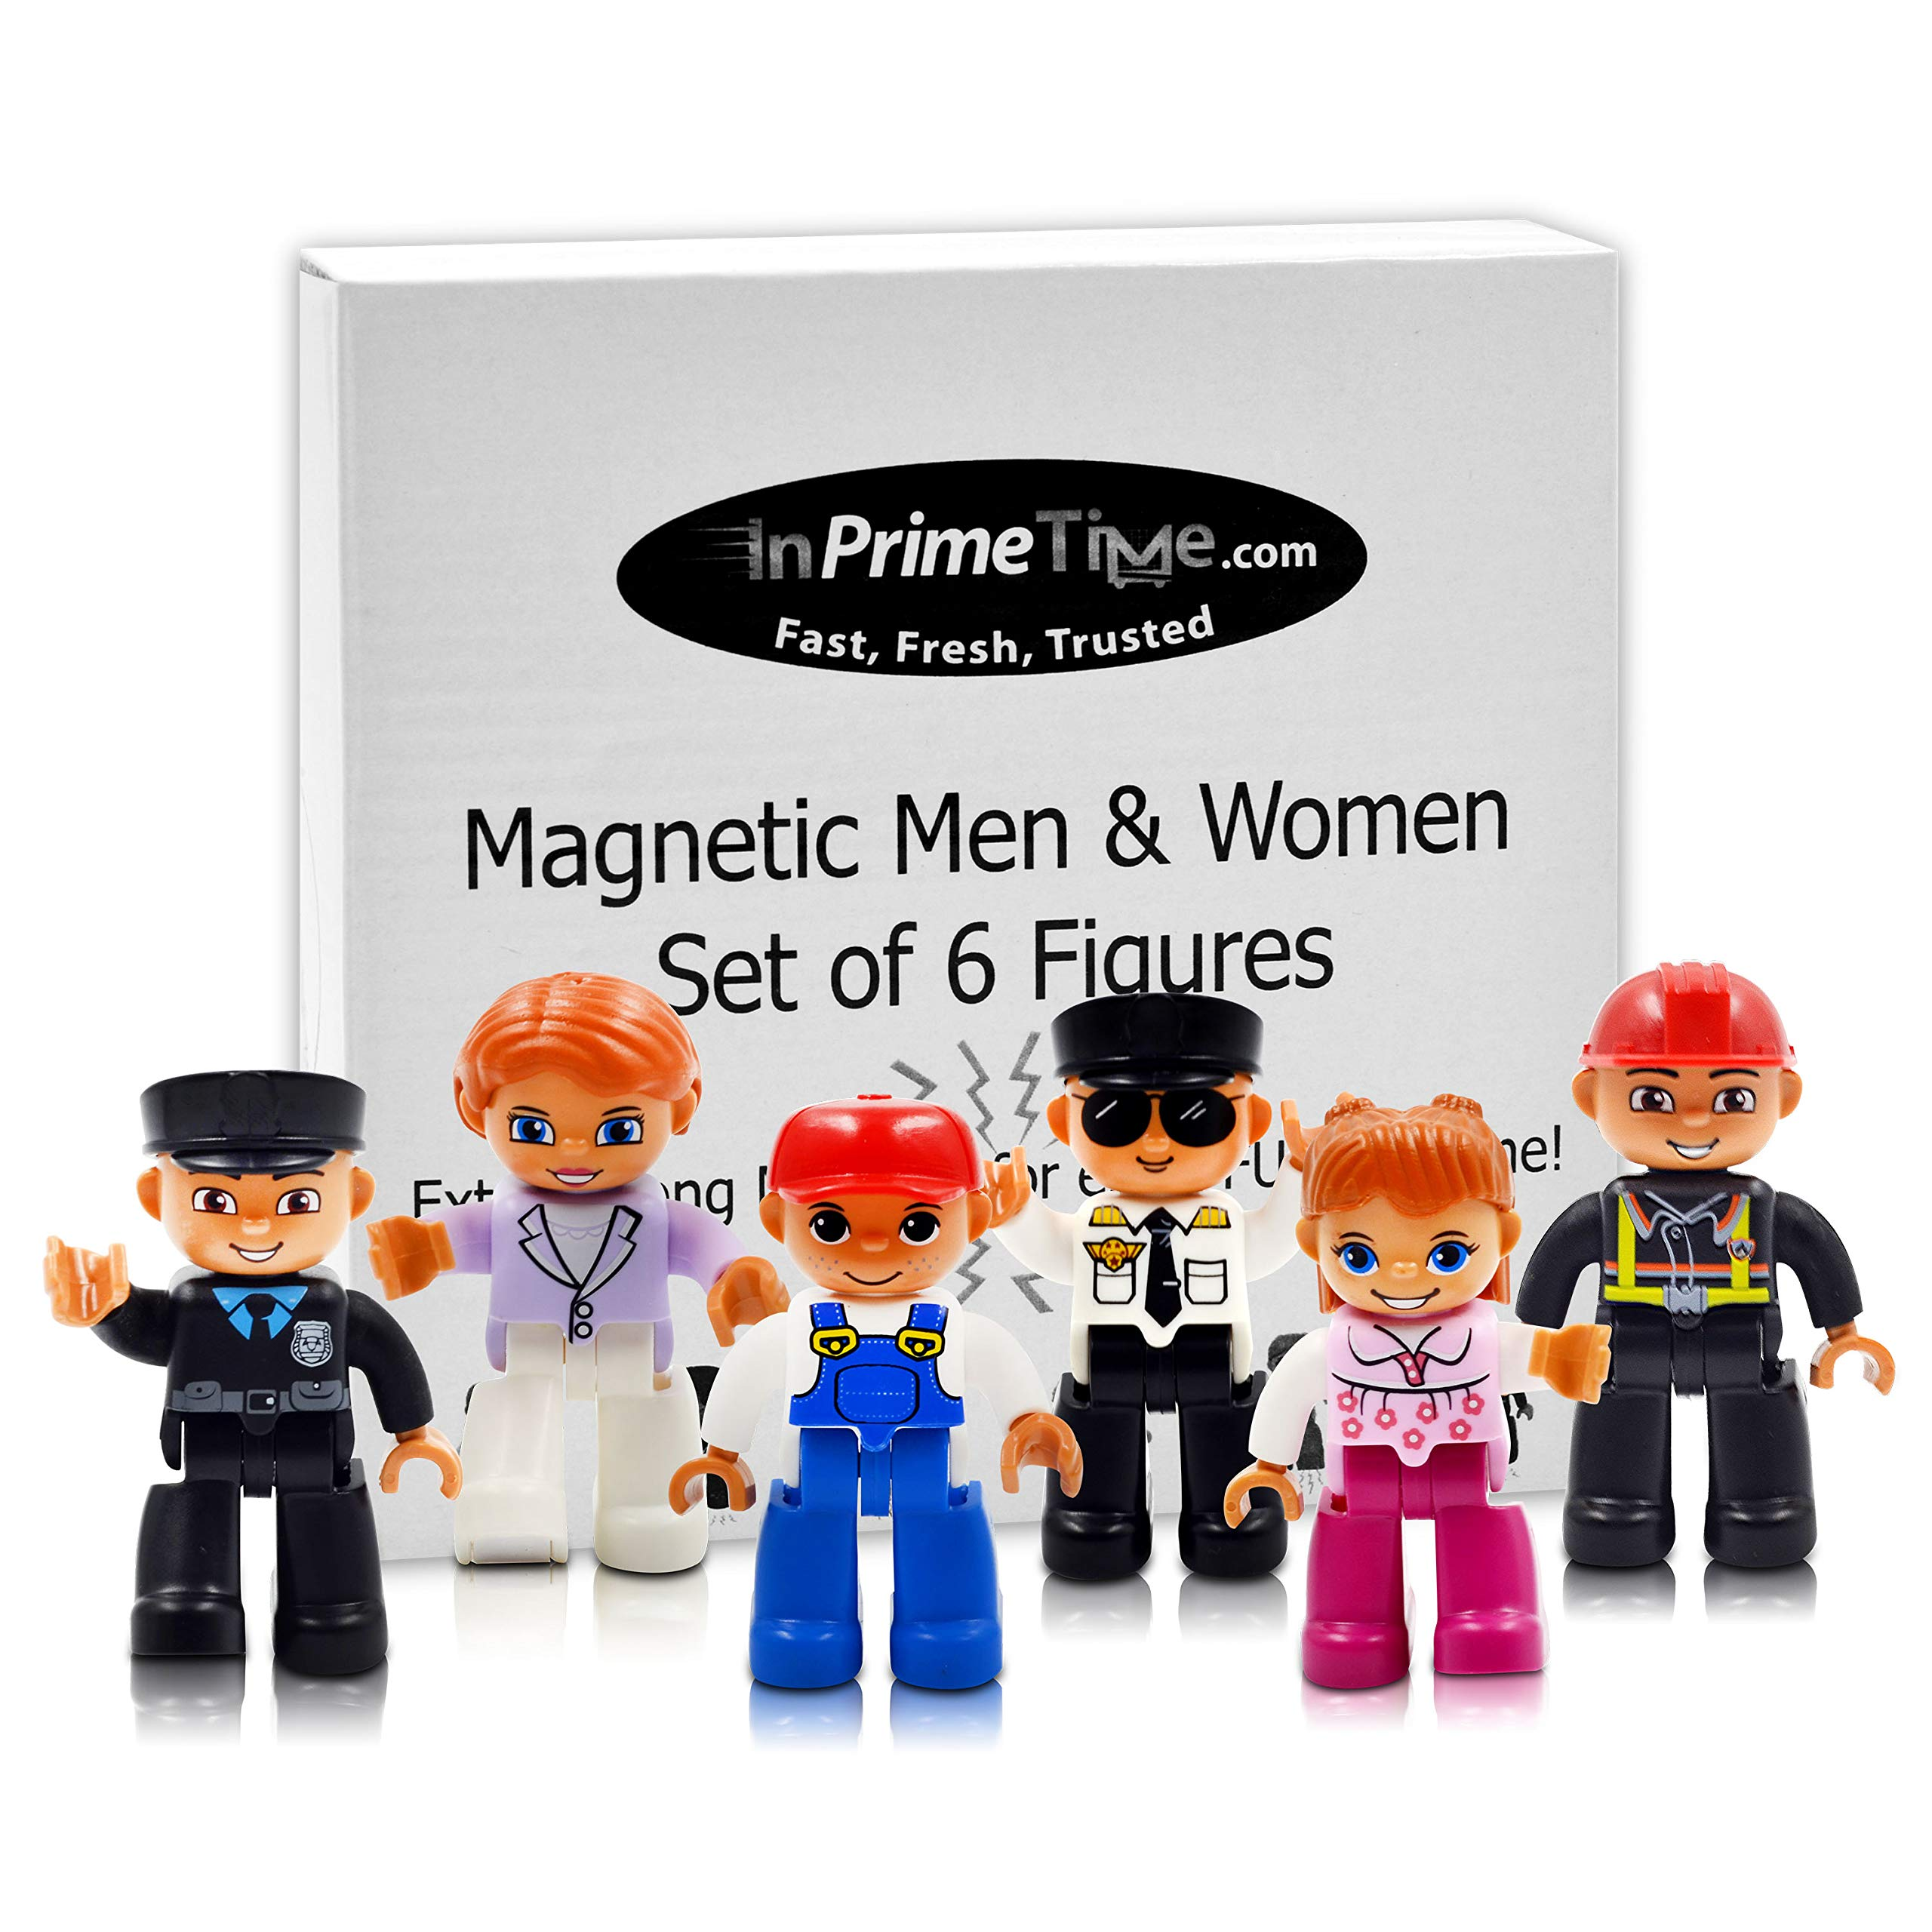 InPrimeTime Magnetic Men, Women, People: Set of 6 Community Helper Figures. Compatible w/ MagnaTiles, MagnaBlocks, All Magnetic Building & Tile Sets by InPrimeTime